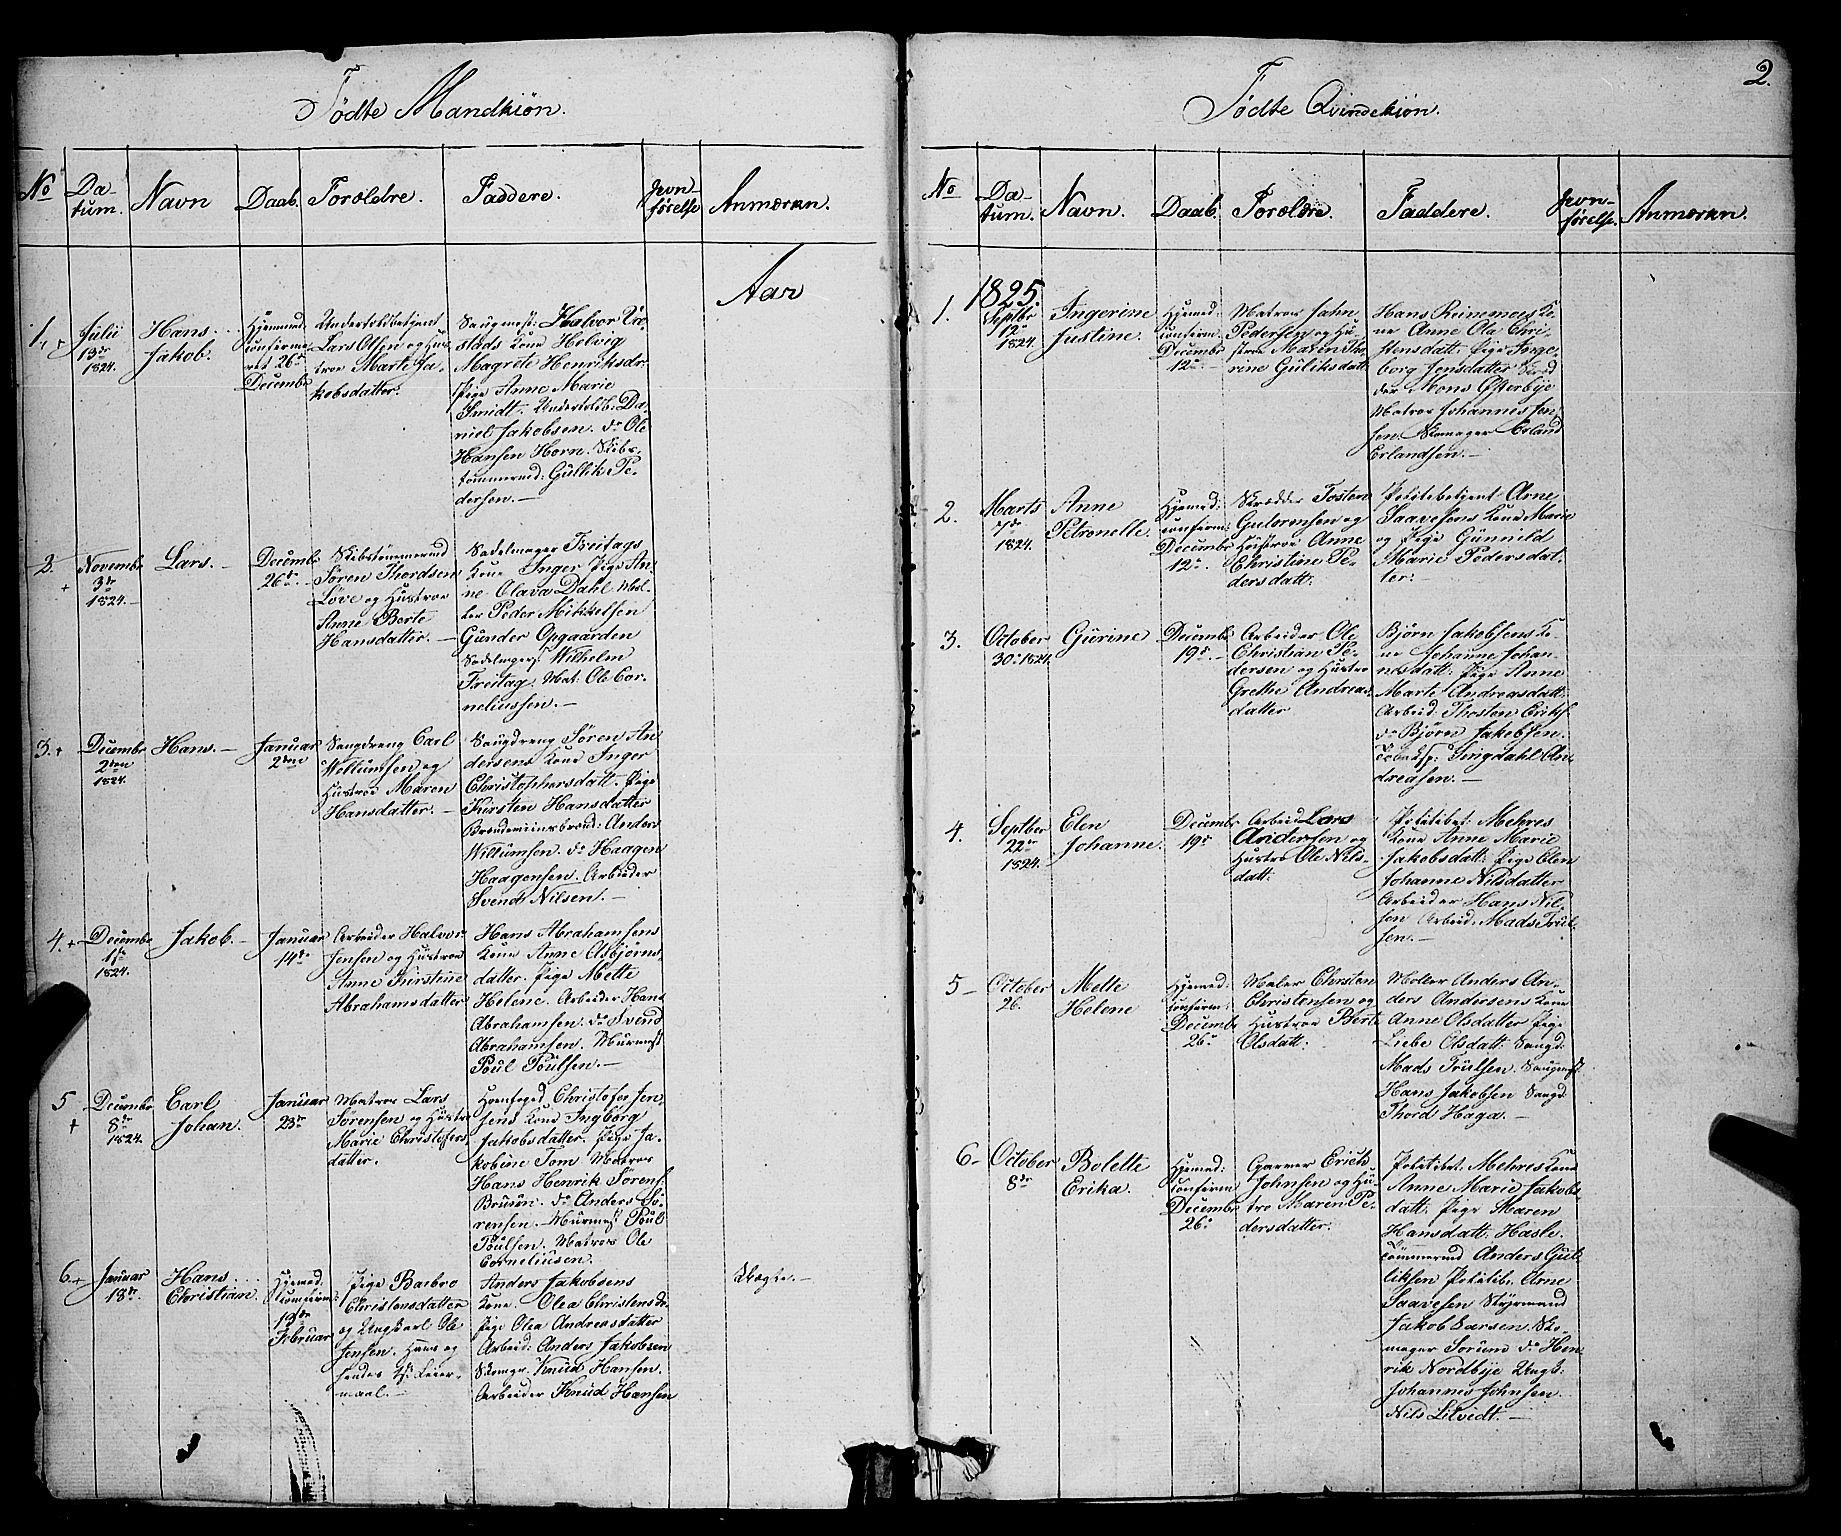 SAKO, Larvik kirkebøker, F/Fa/L0002: Ministerialbok nr. I 2, 1825-1847, s. 2